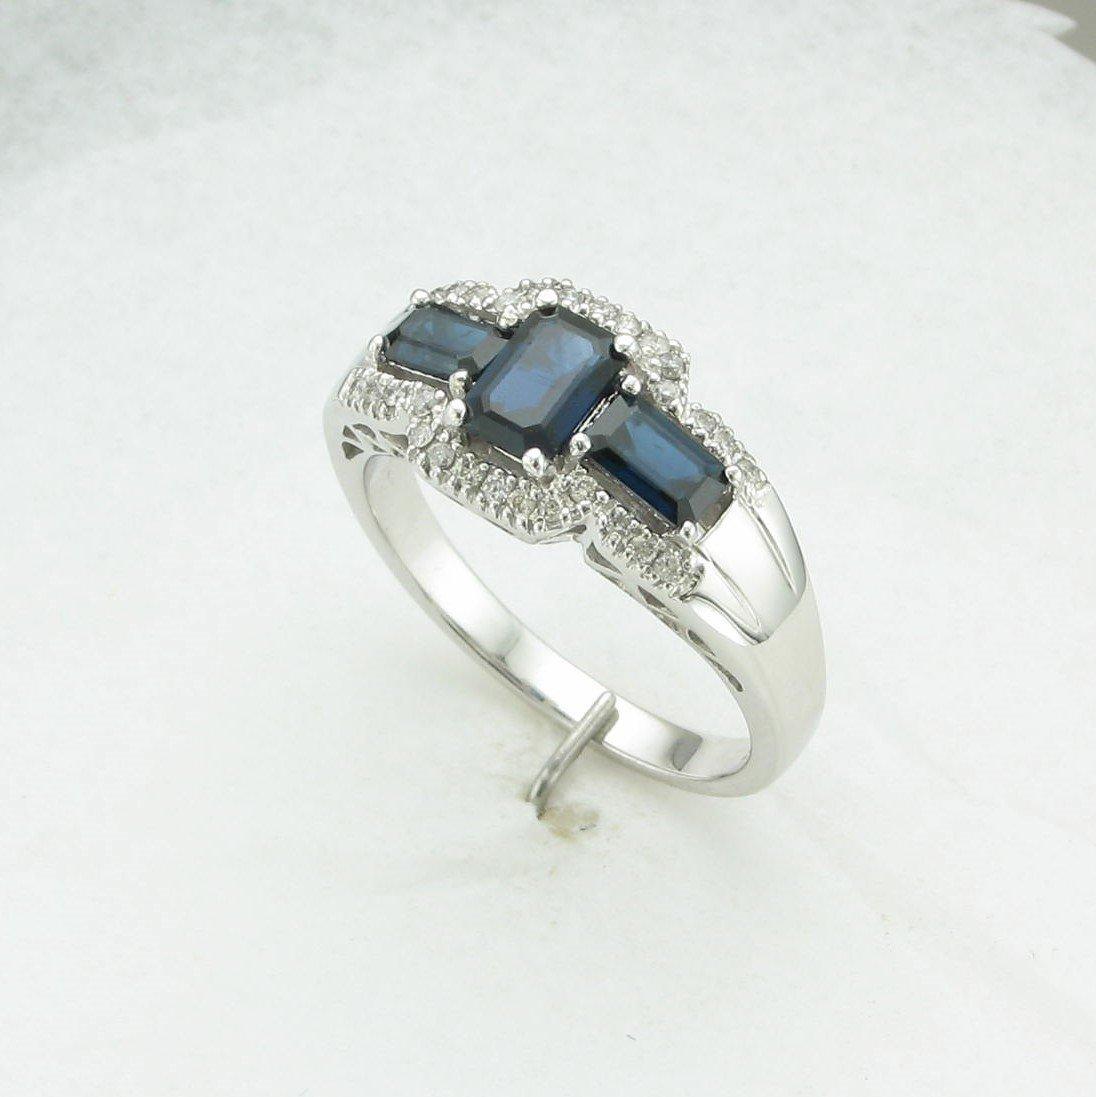 1.28tcw Sapphire & Diamond Ring set in 14k White Gold